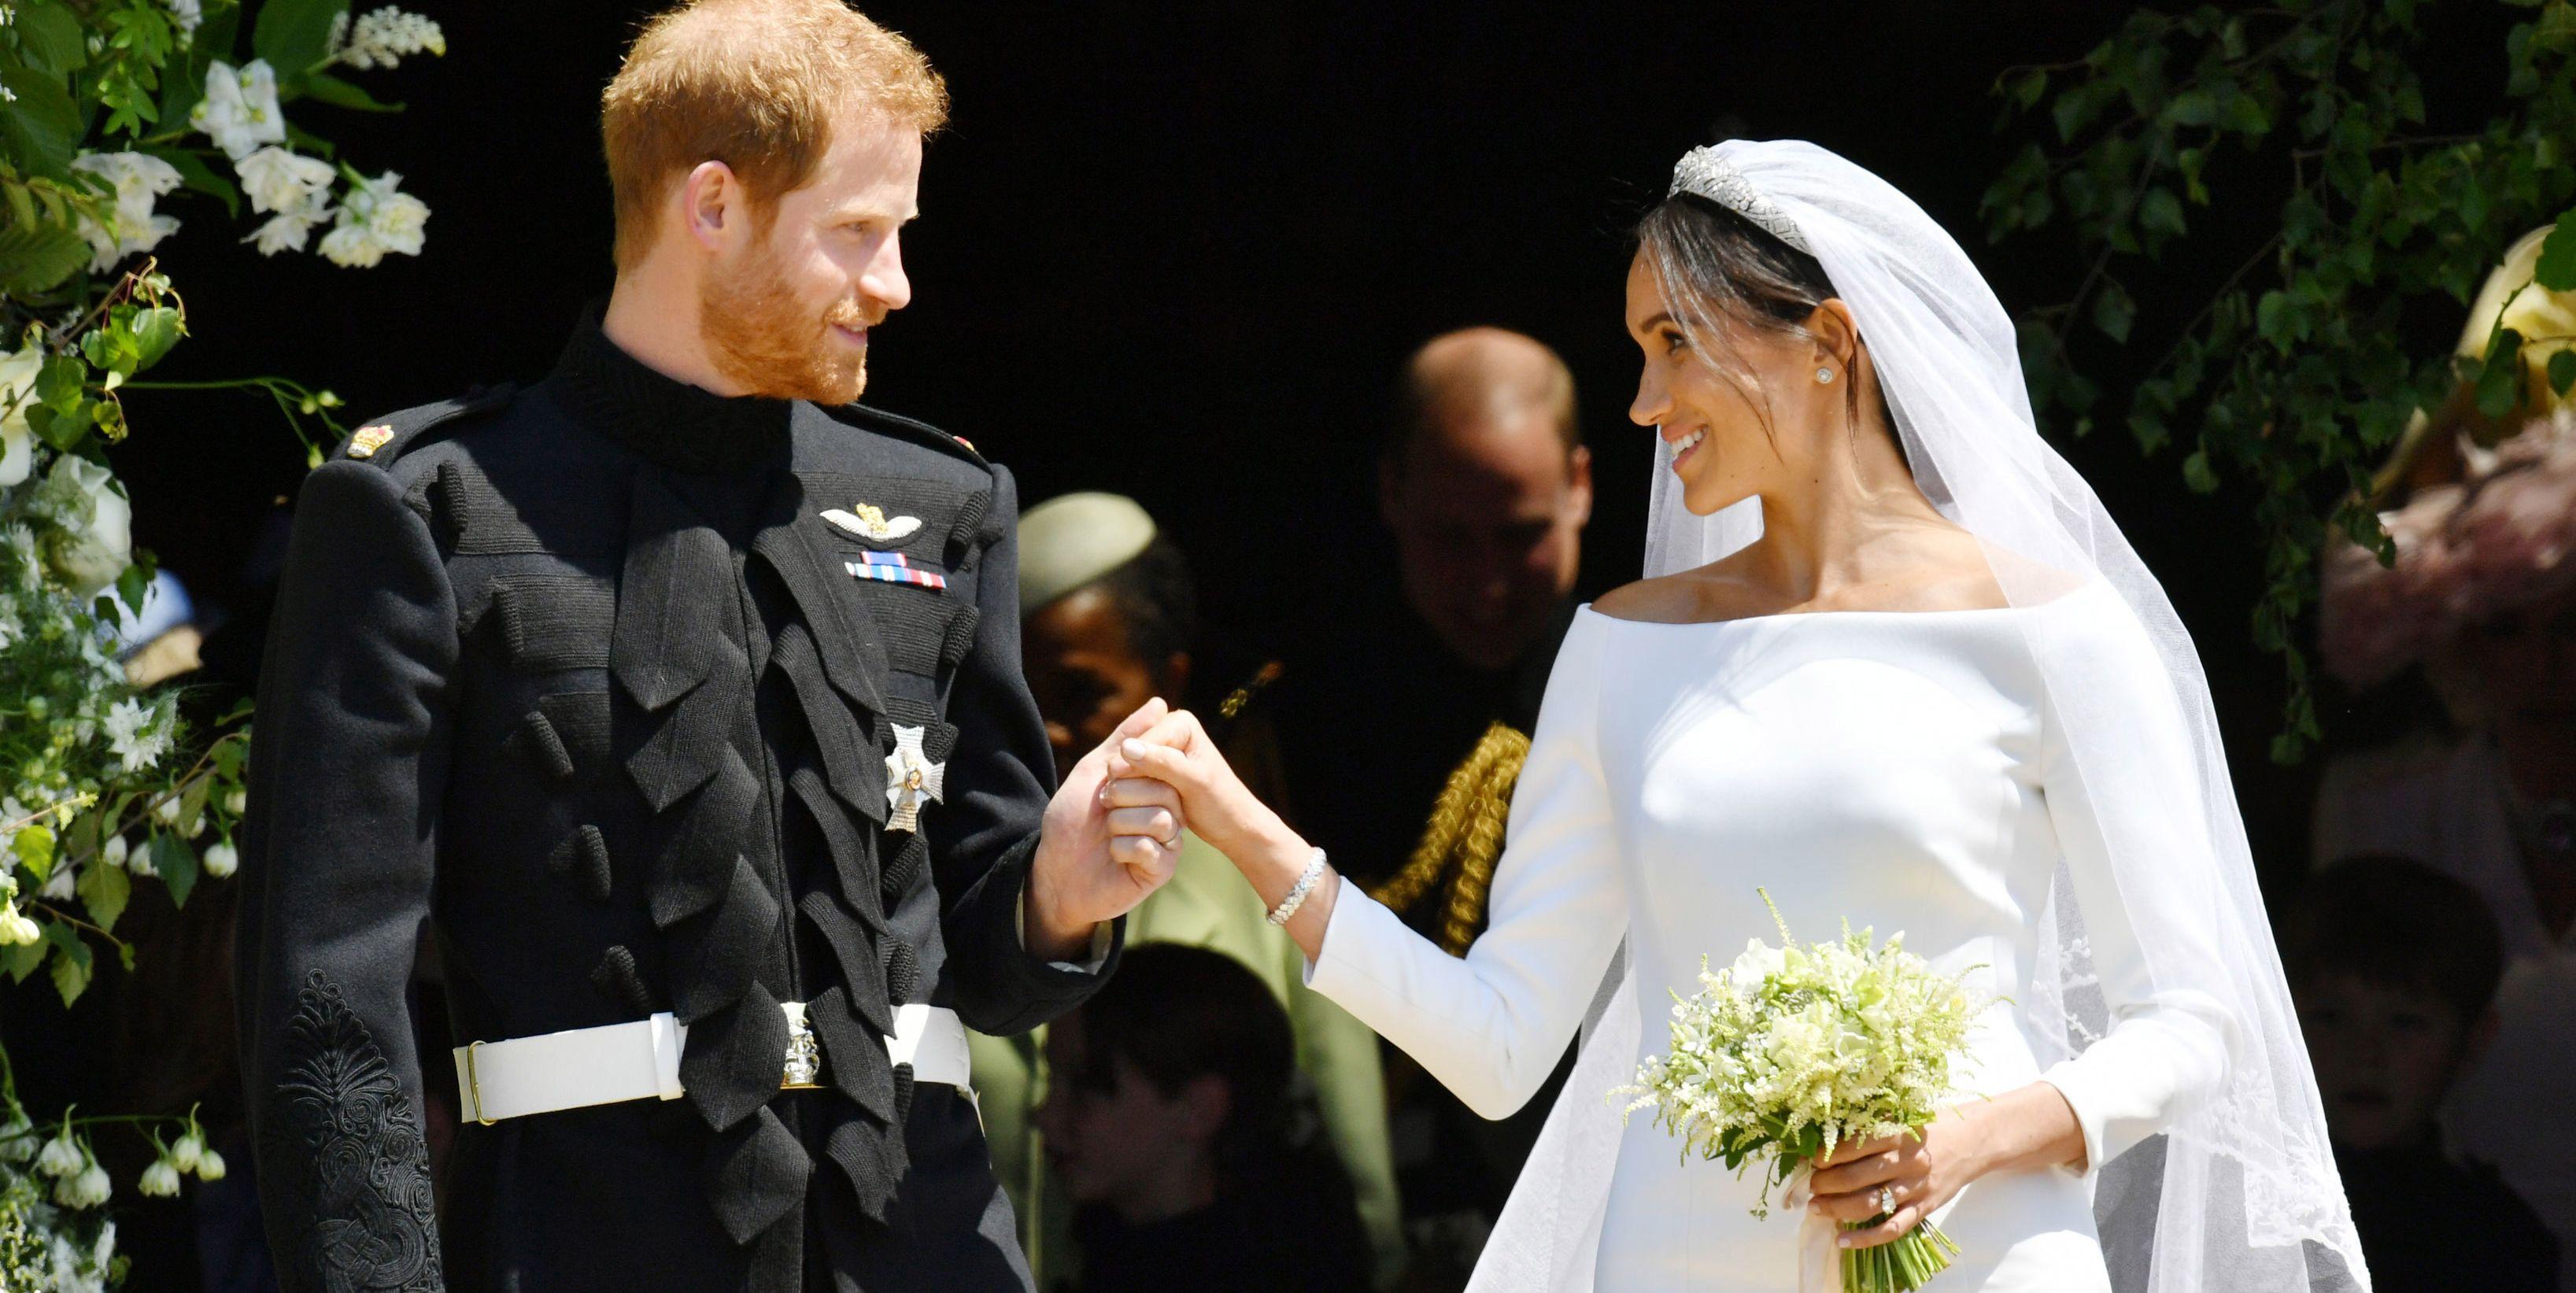 Red wedding reaction celebrity news